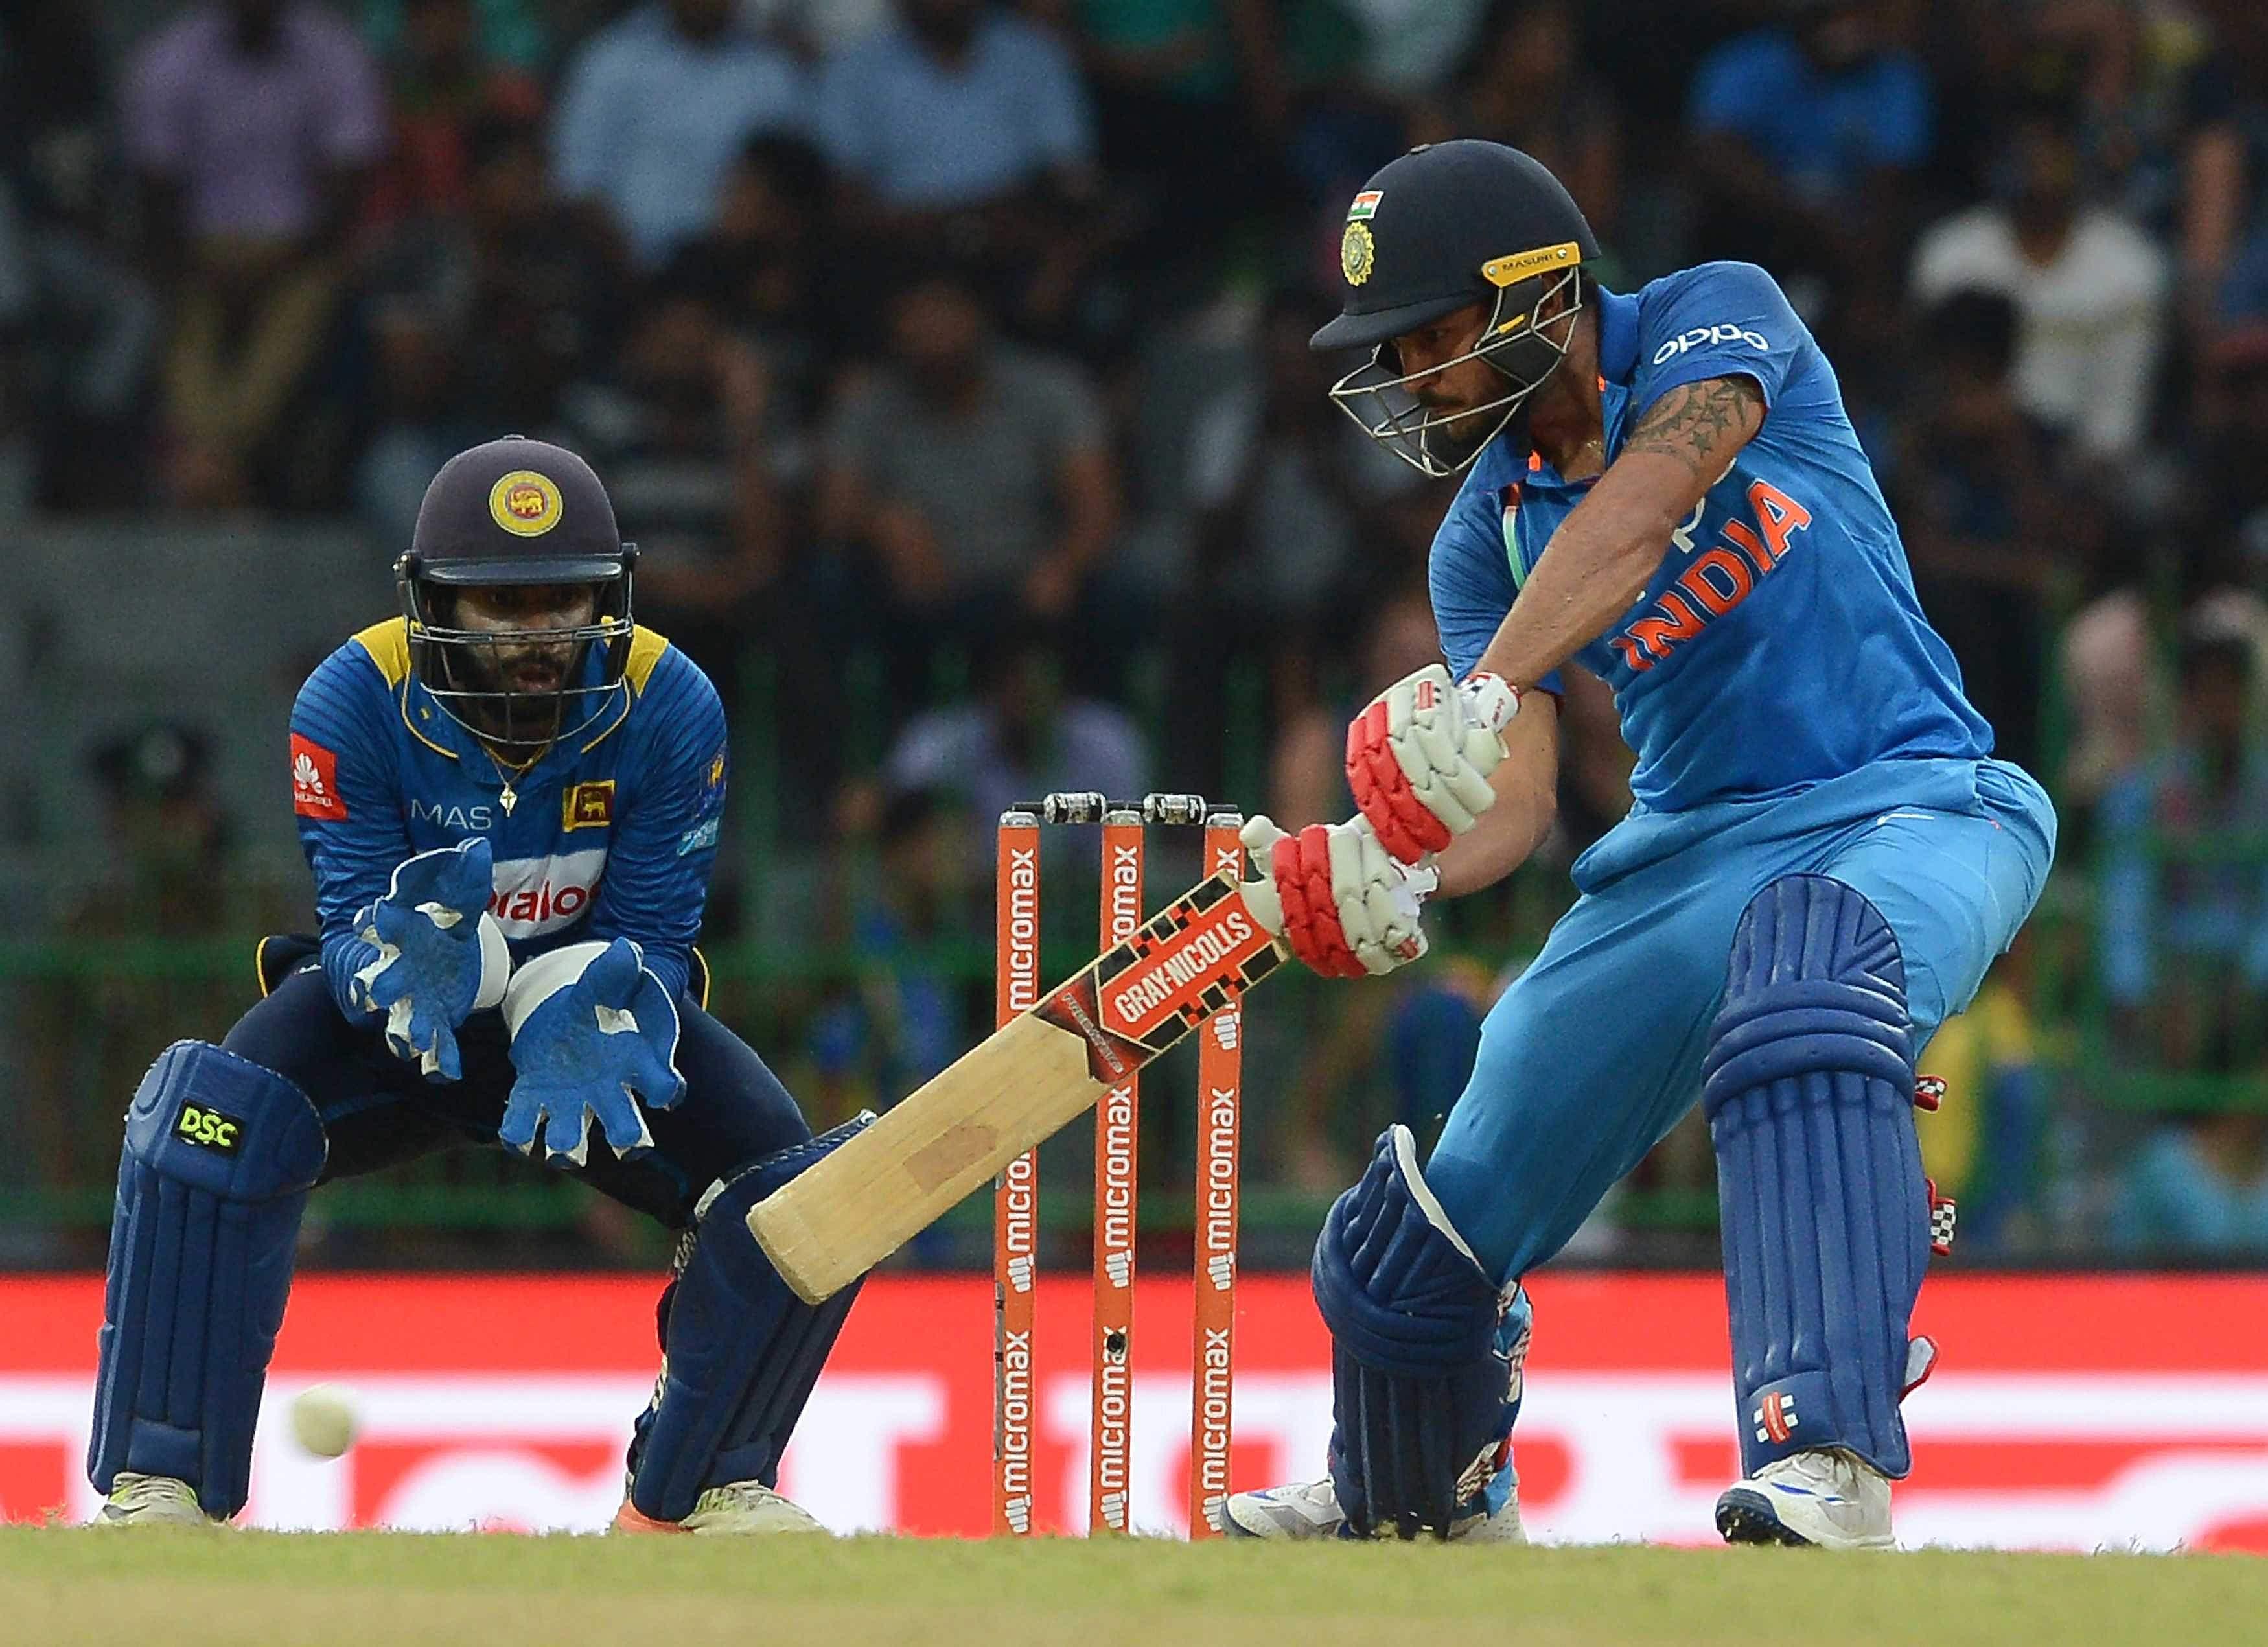 team india, srilanka, mumbai, t20 match, indvsl, live score updates, live cricket score